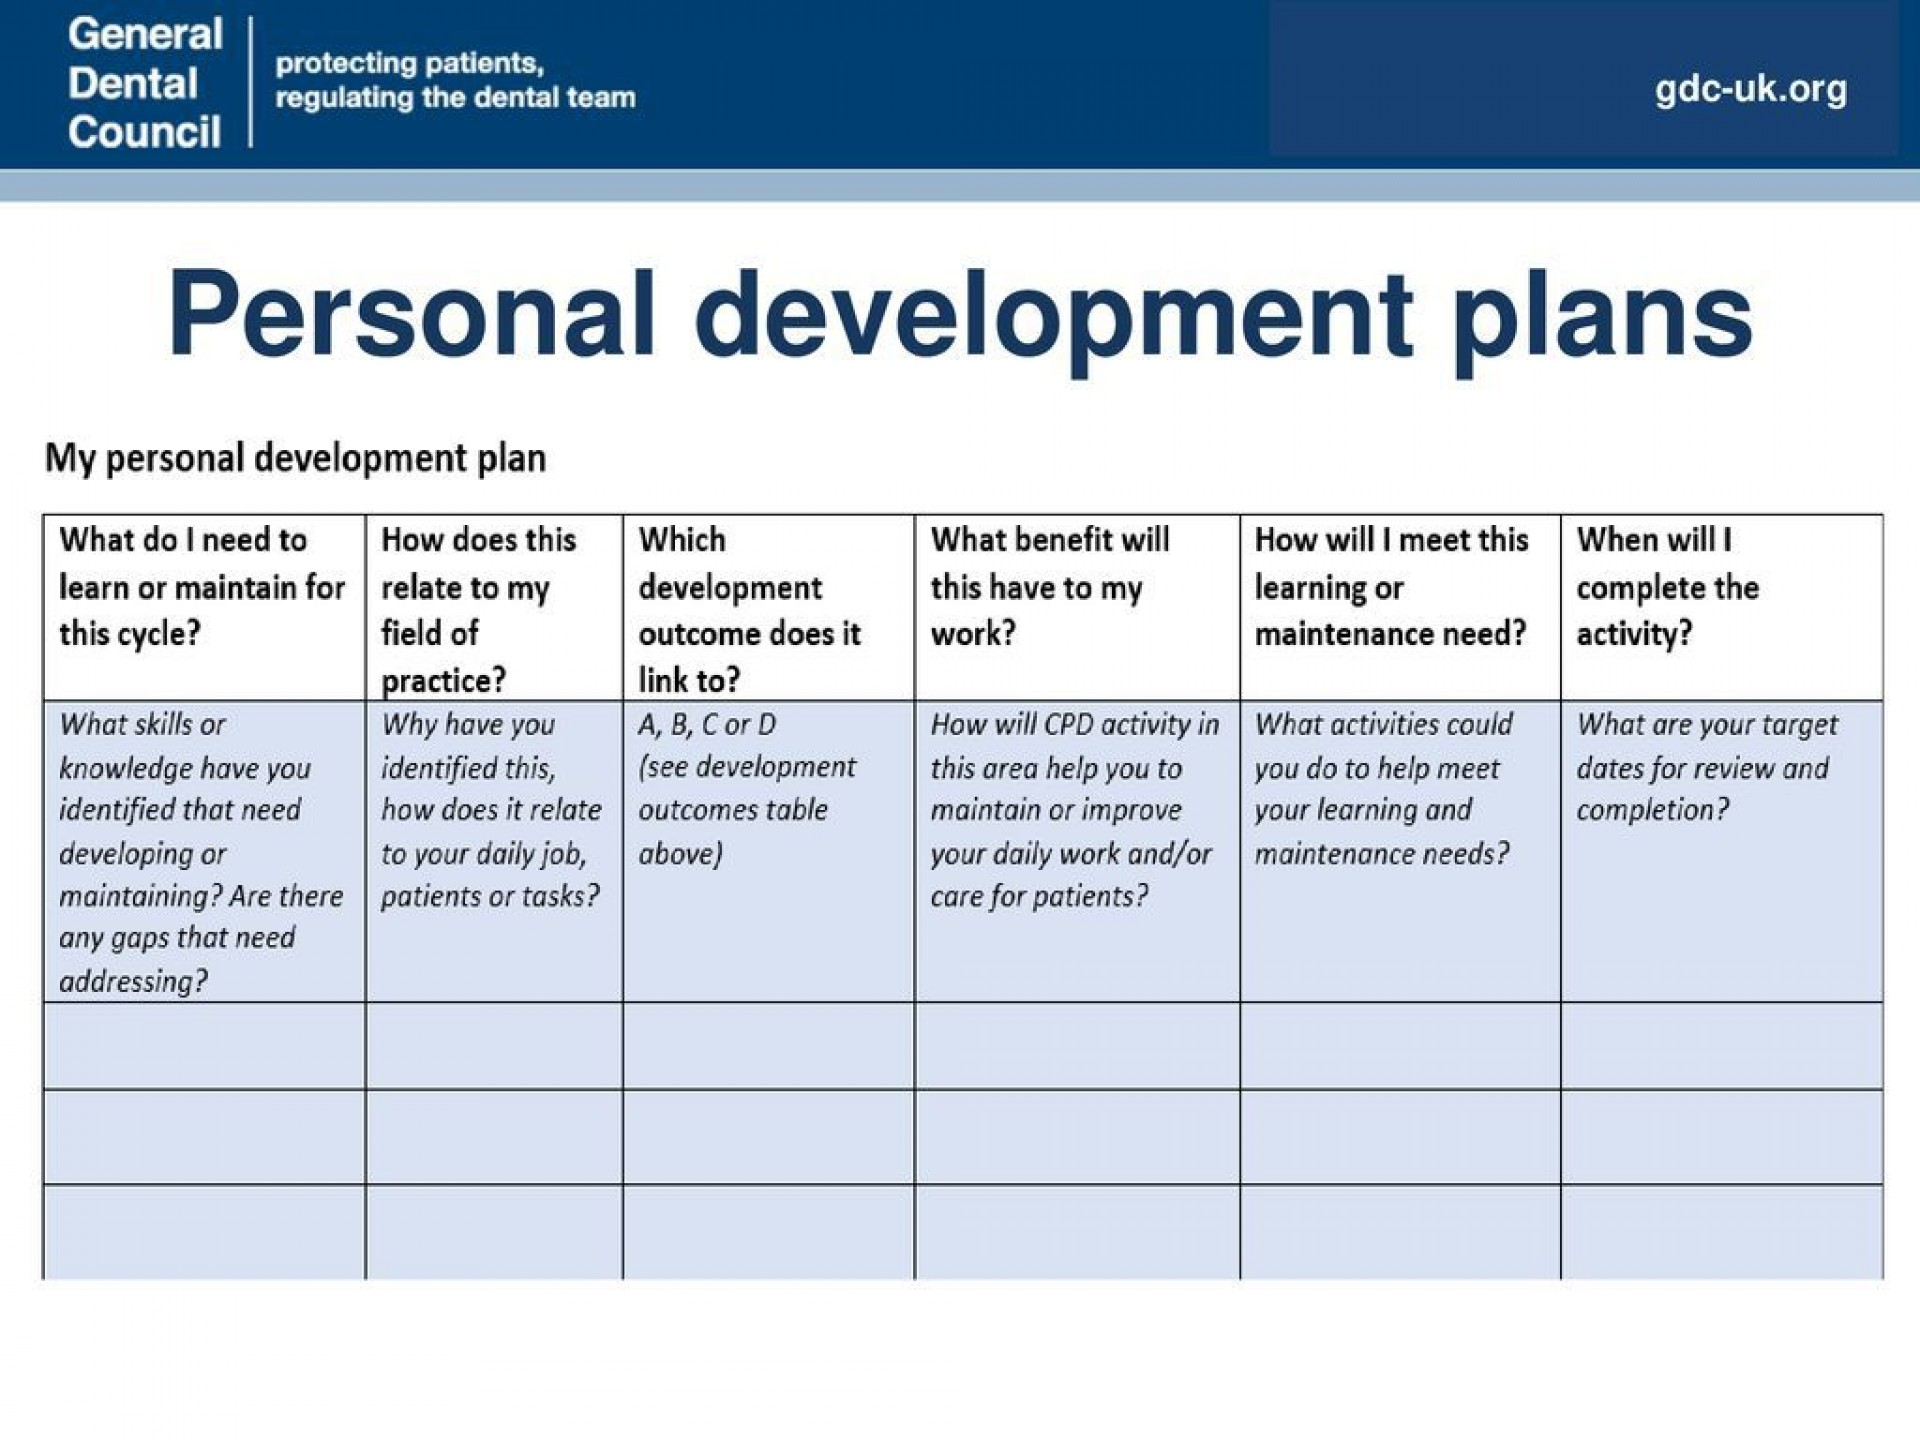 007 Stirring Personal Development Plan Template Gdc Example  Free1920